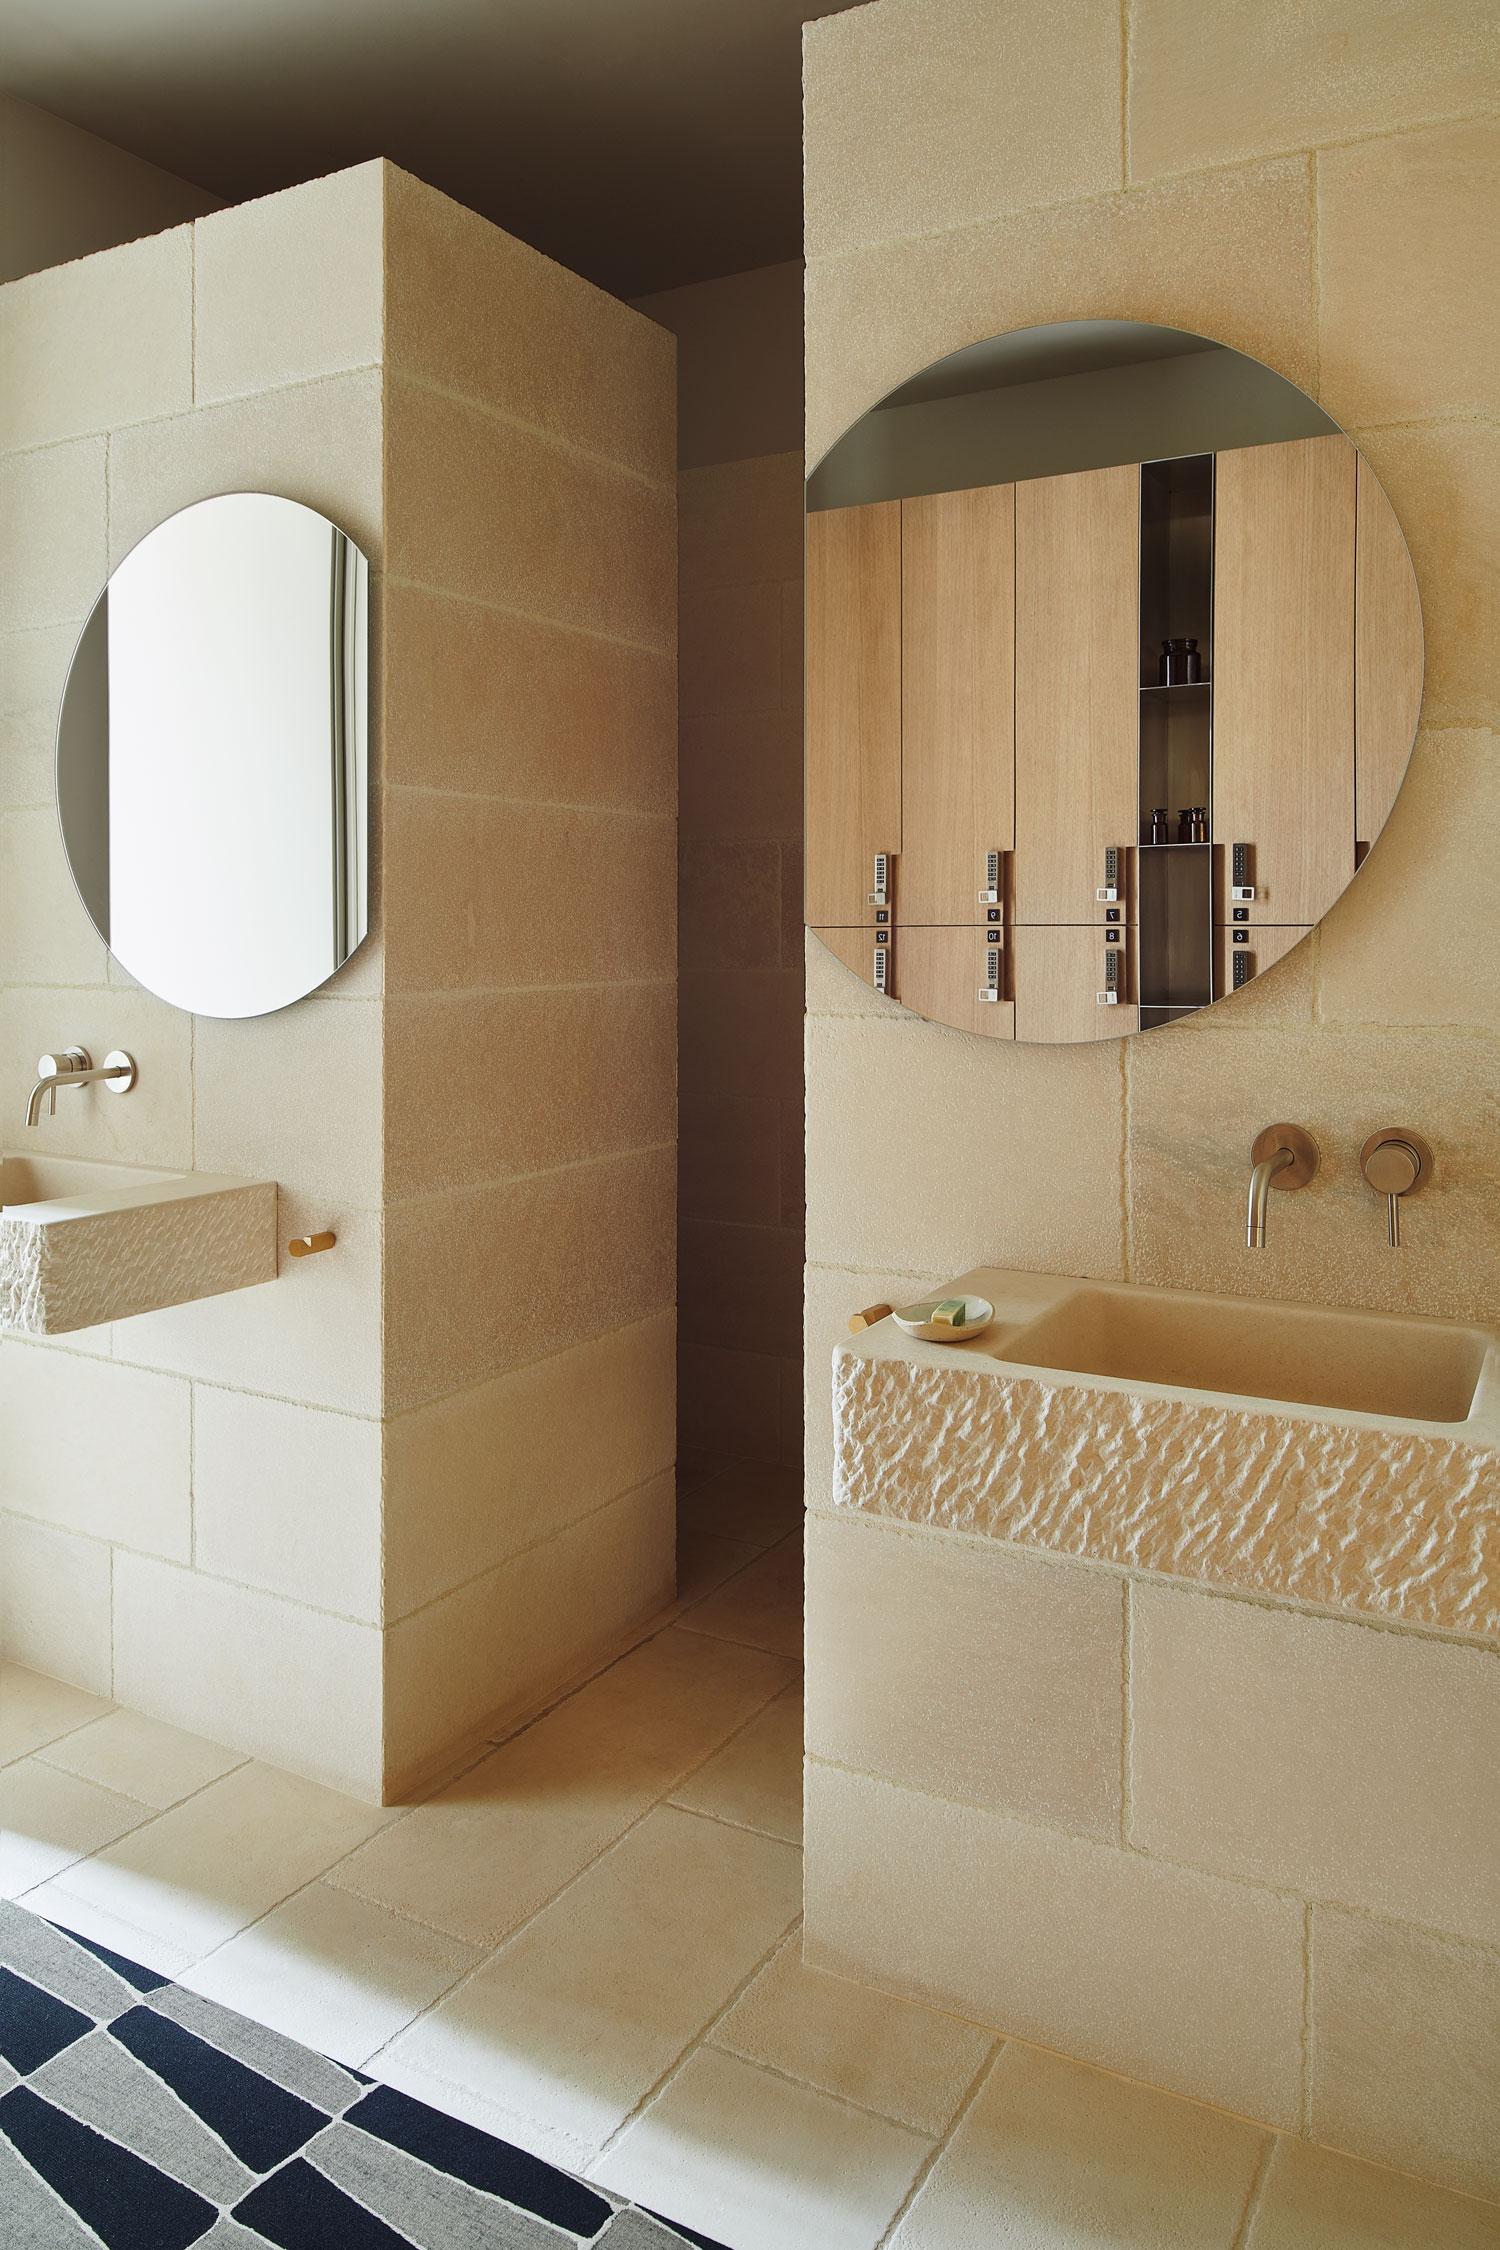 Lam Studio Hotel Maslina Hvar Croatia Luxury Accommodatino Photo Claire Israel Yellowtrace 09